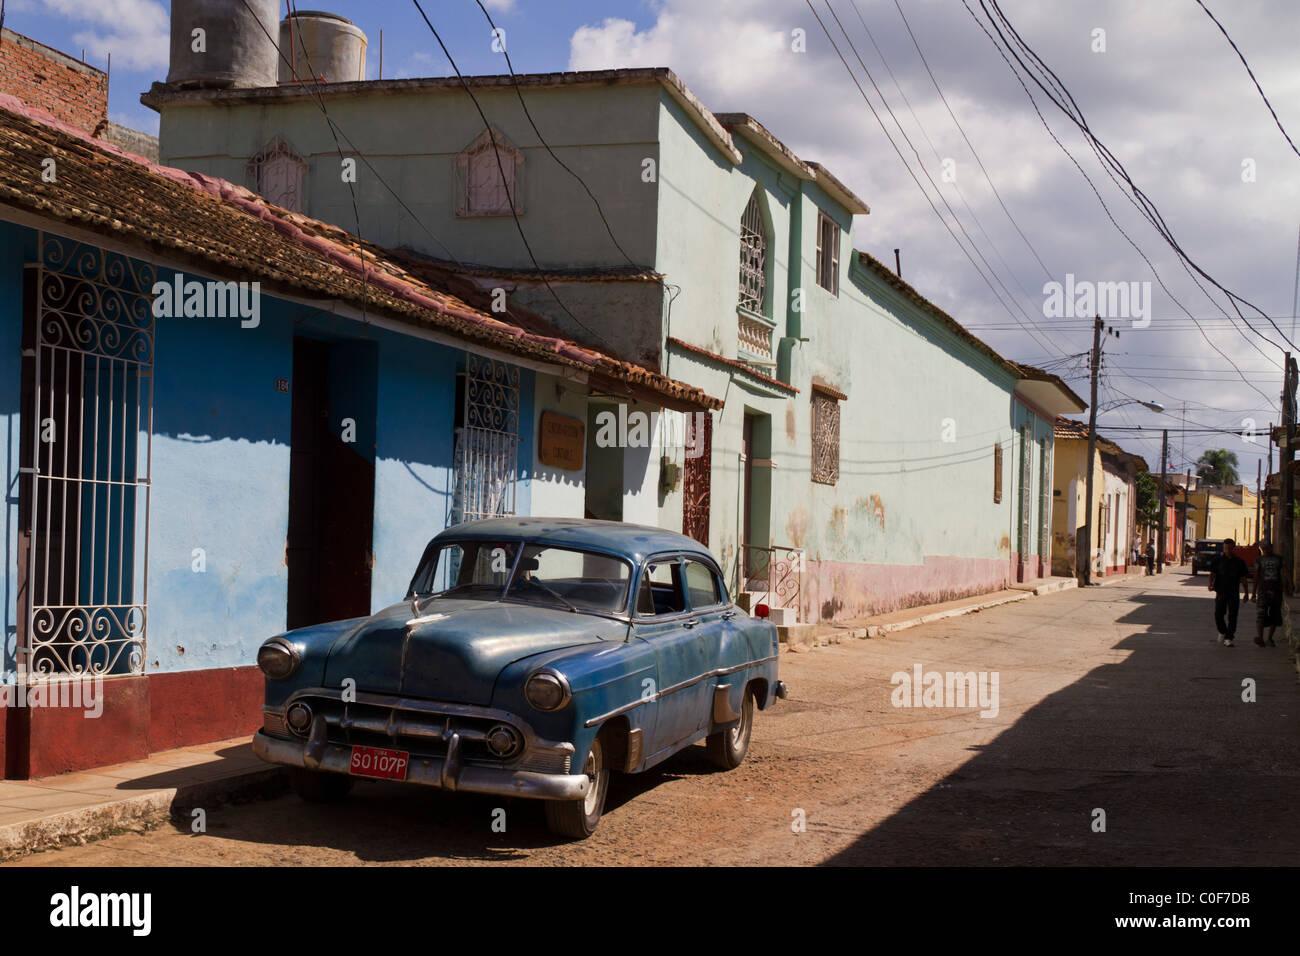 Street with Oldtimer, Trinidad Cuba - Stock Image